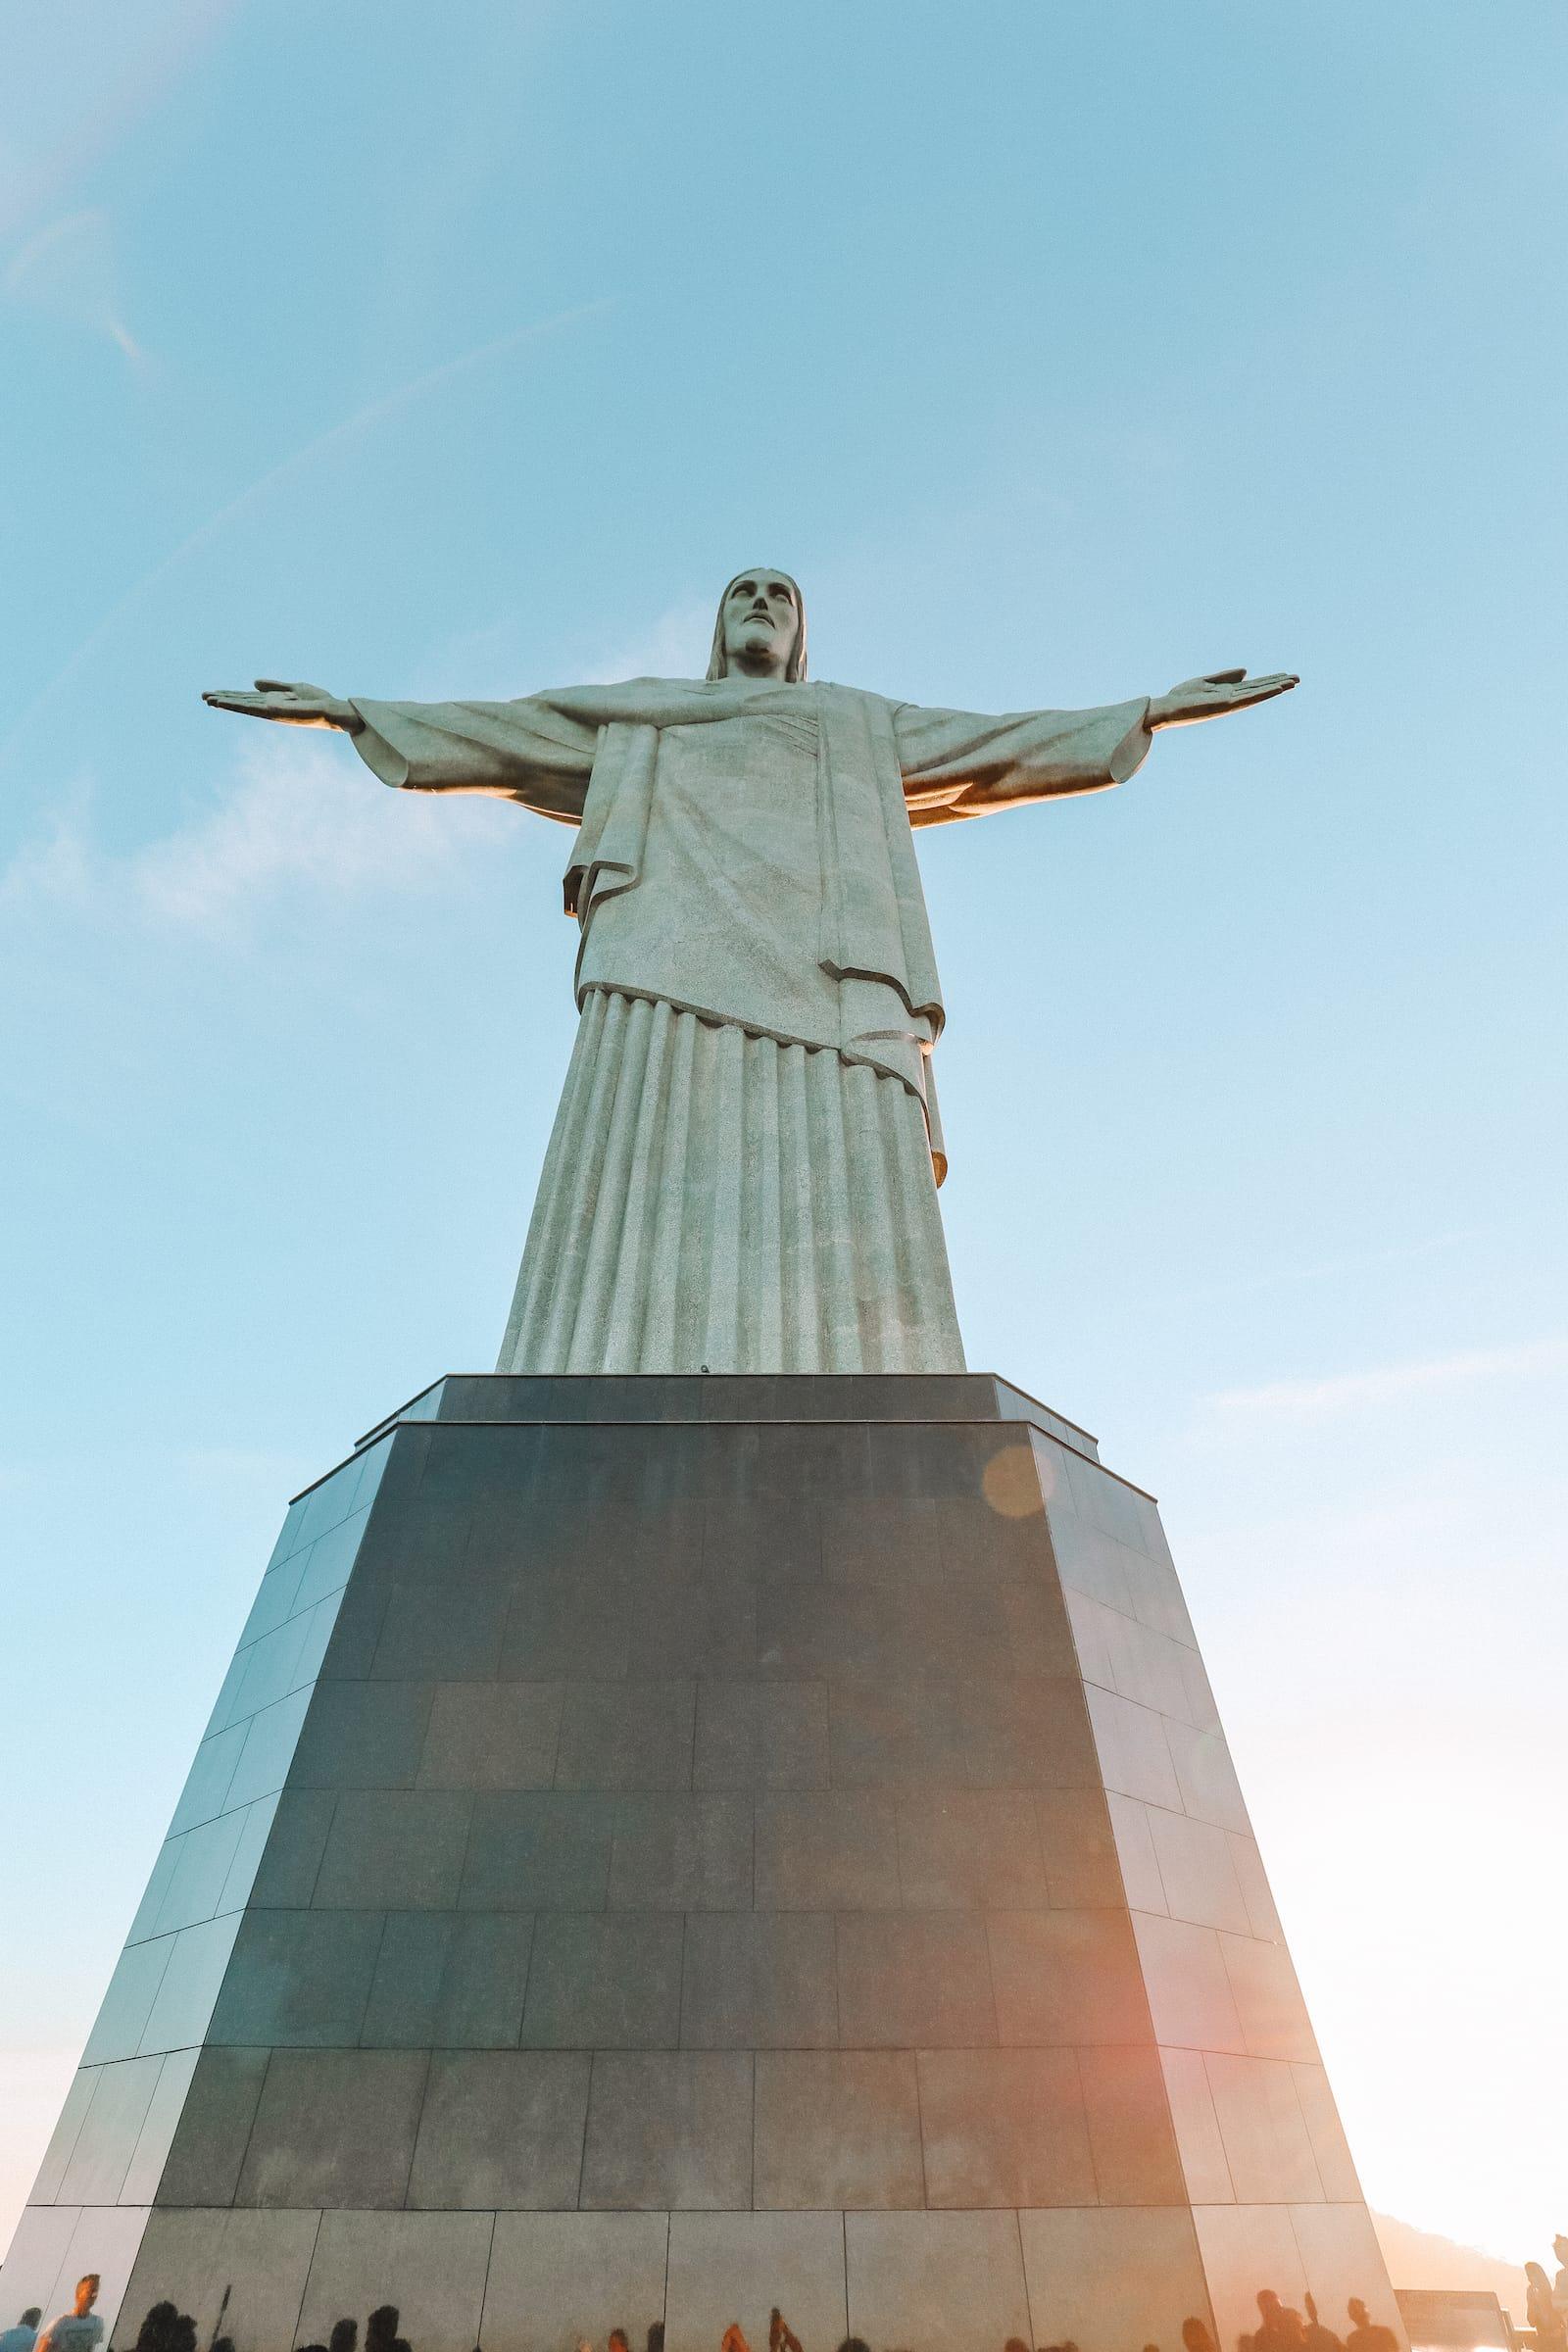 Photos And Postcards From Rio De Janeiro, Brazil (6)